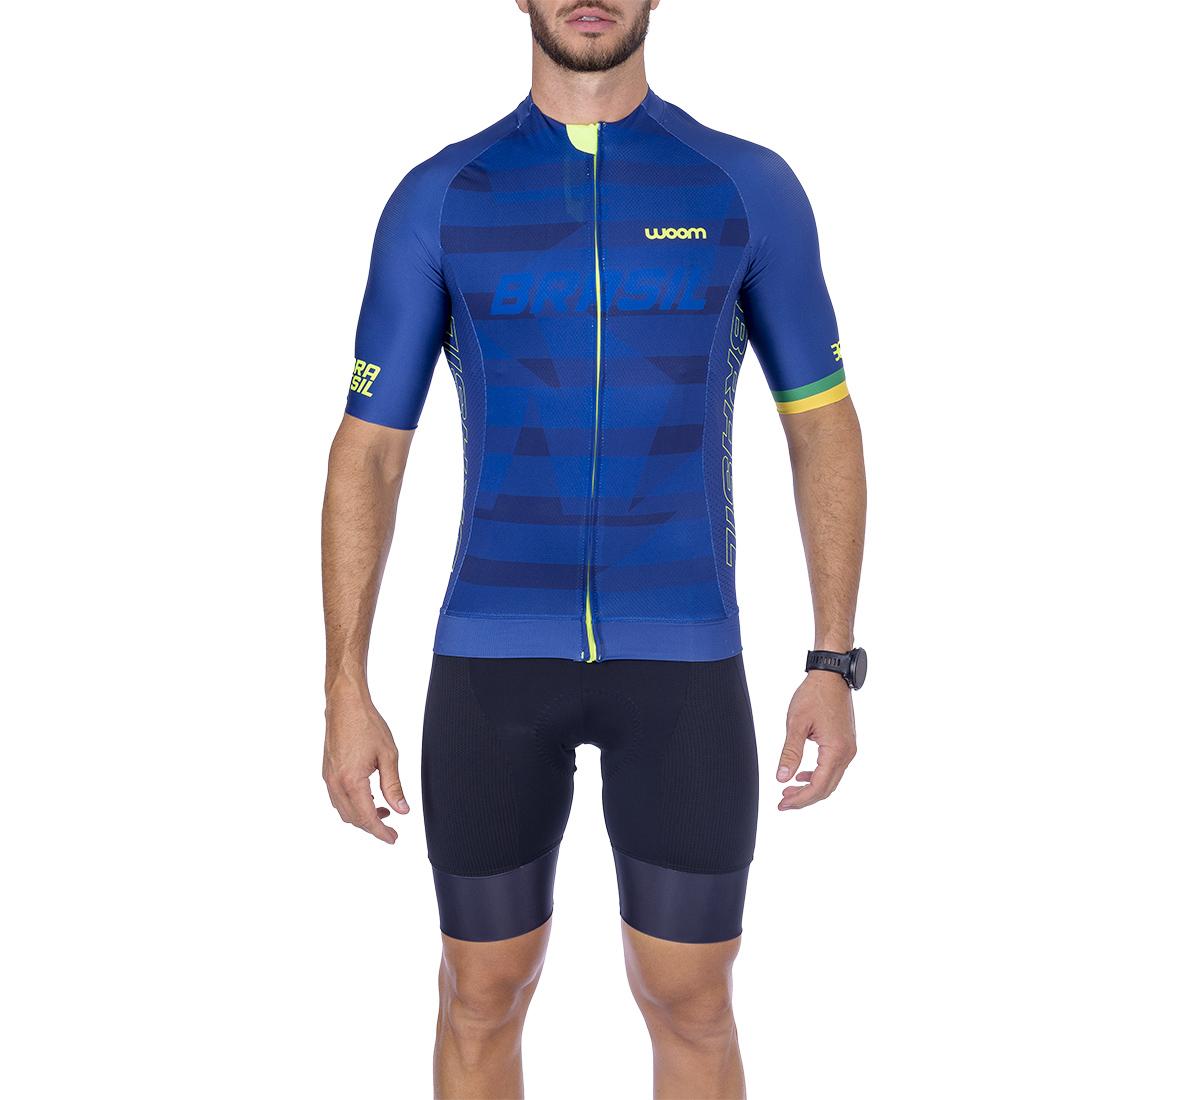 Camisa Ciclismo Supreme Brasil Masc - 2021